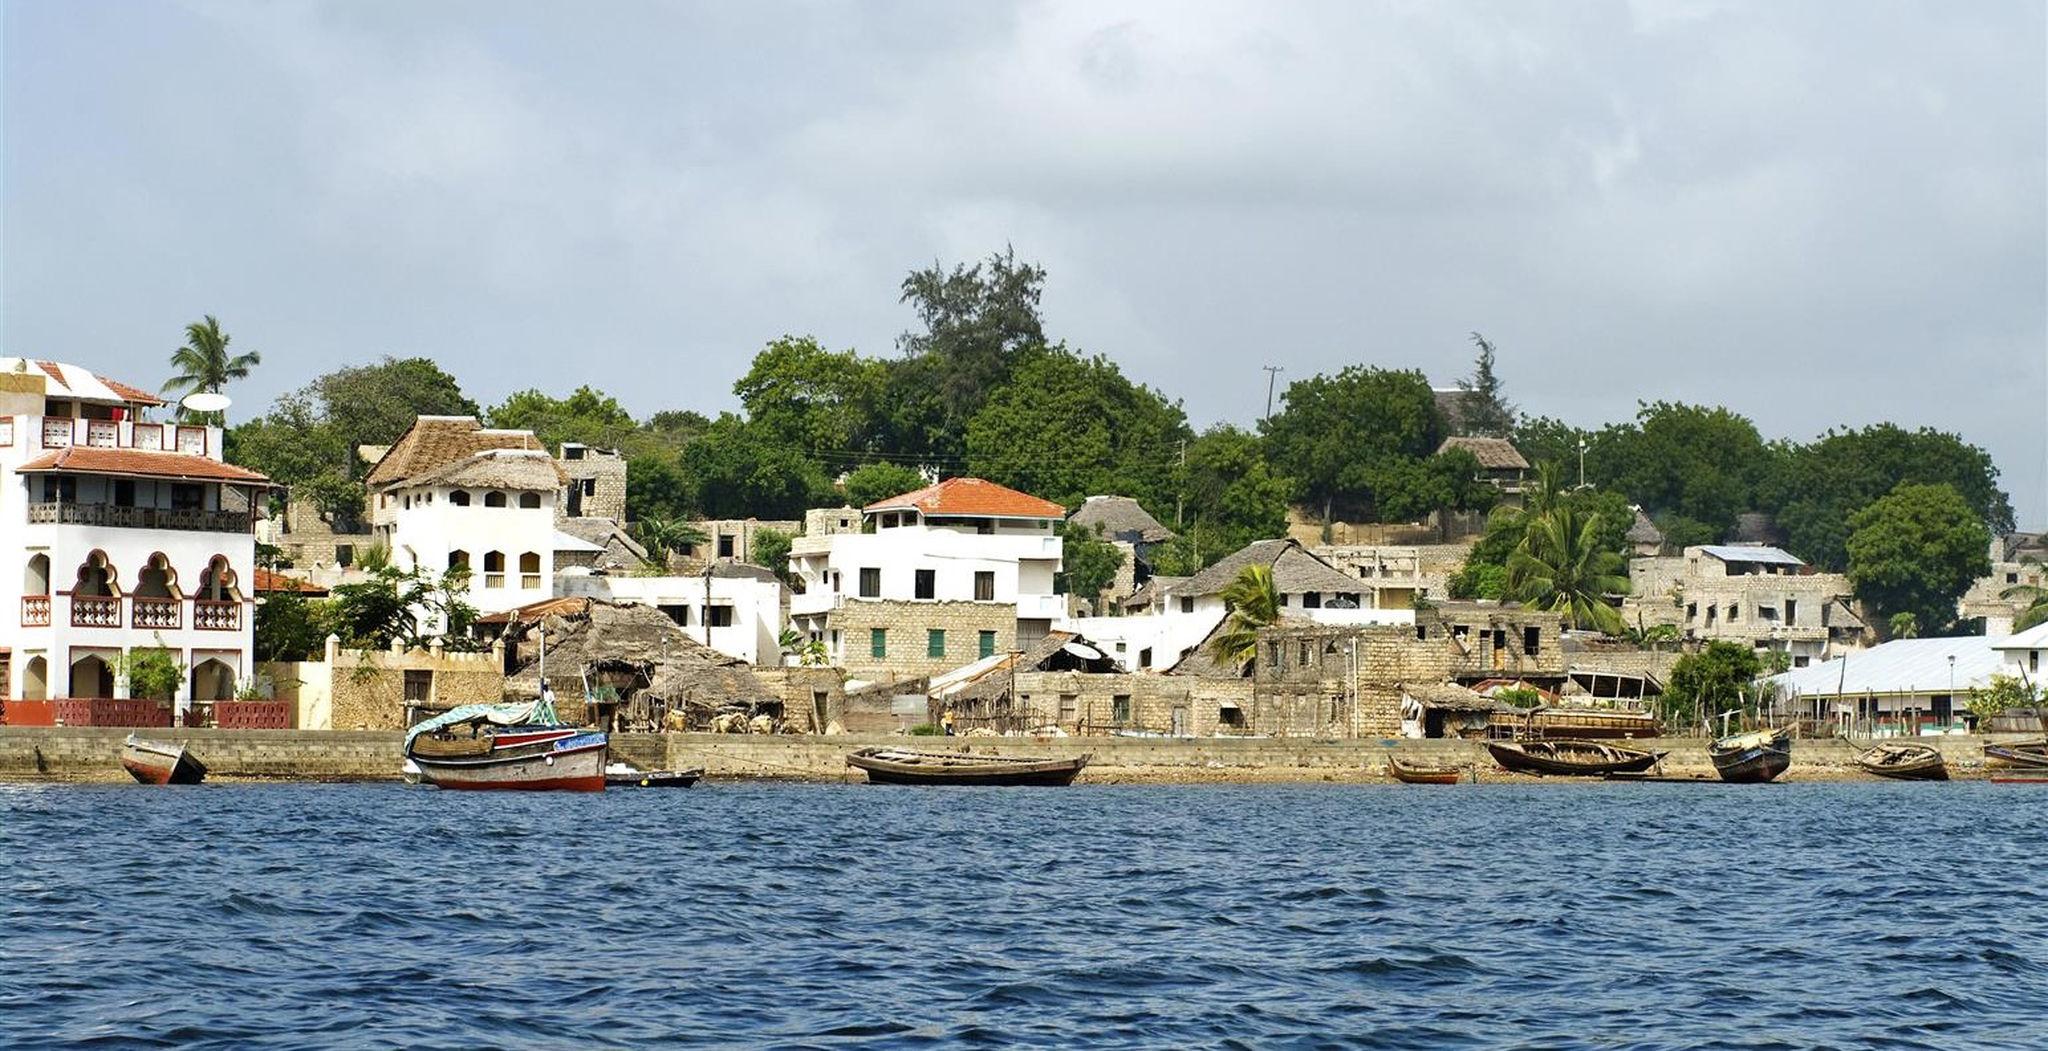 Ciudad de Lamu en la isla de Lamu en Kenia